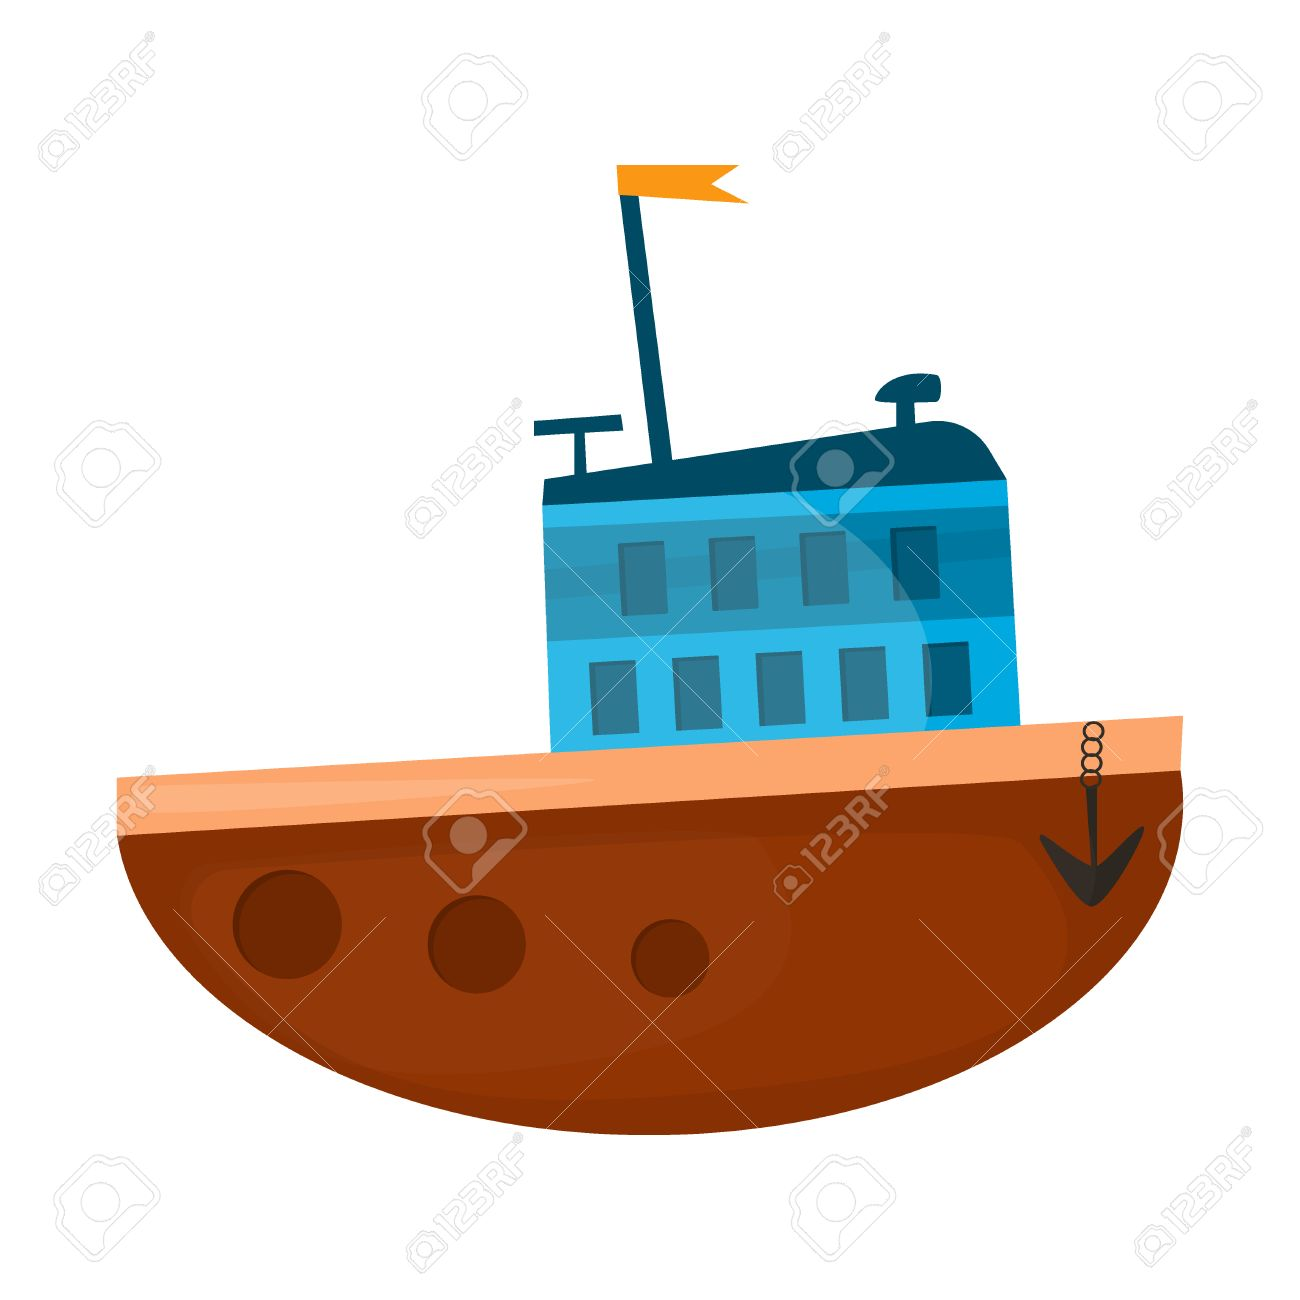 Cartoon Navire Illustration Bateau Cartoon Transport Navire De Mer